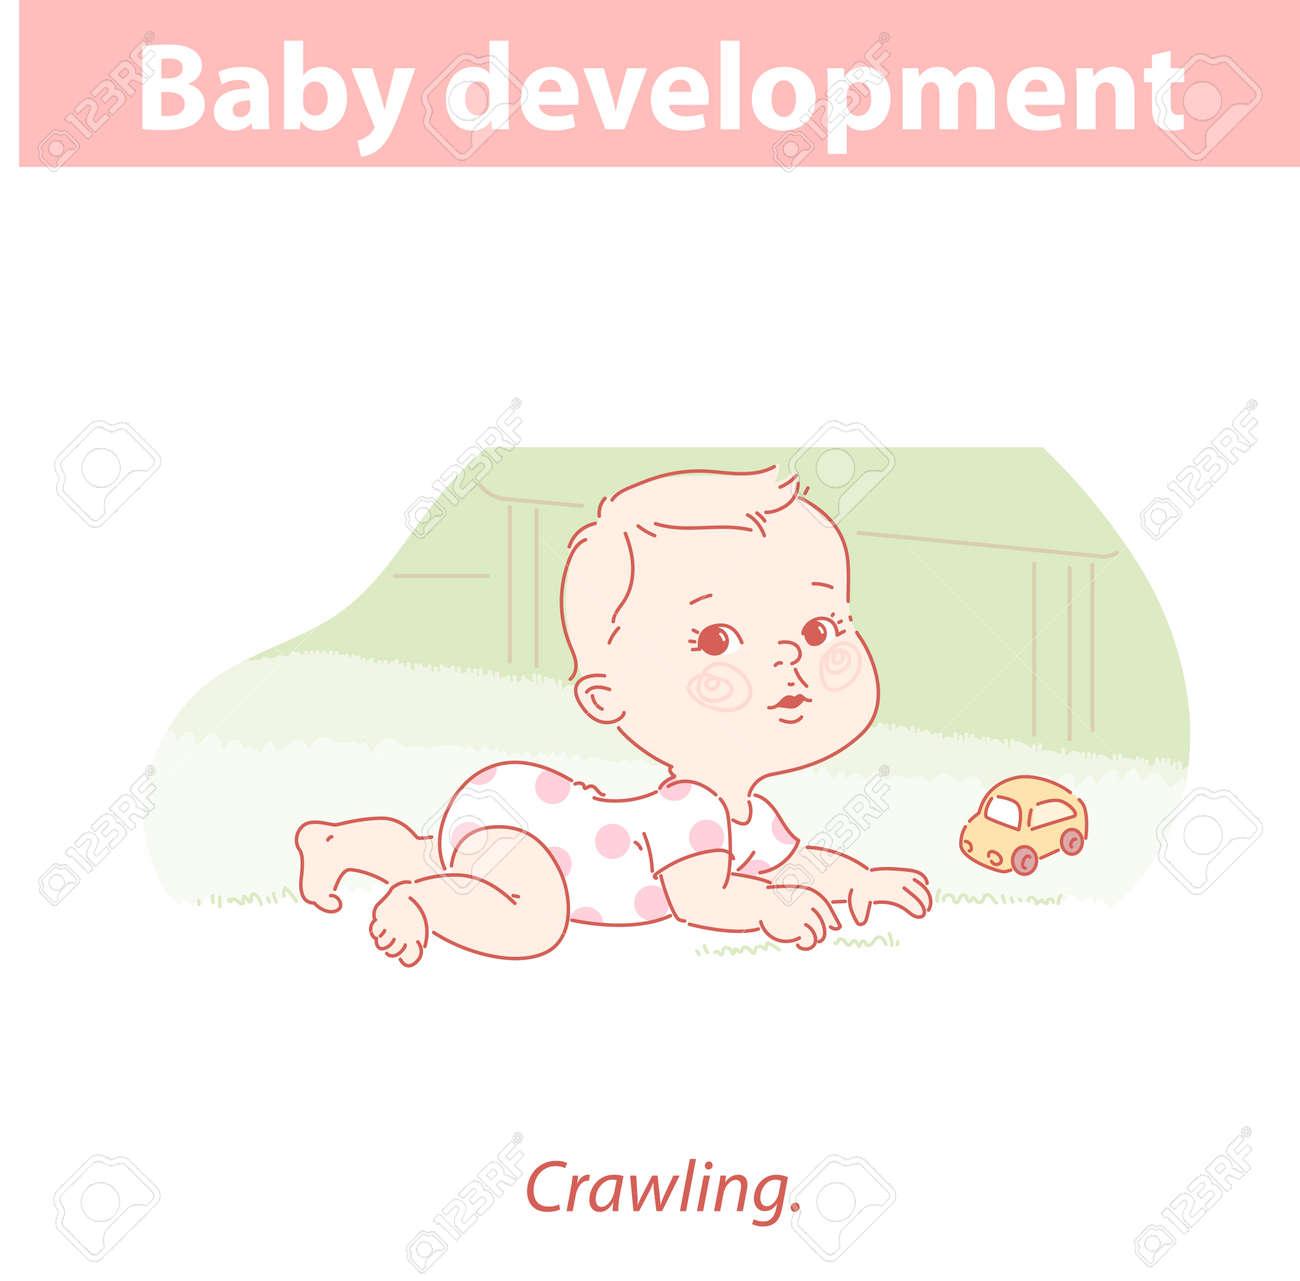 Little baby lying, crawling on carpet. - 156884252